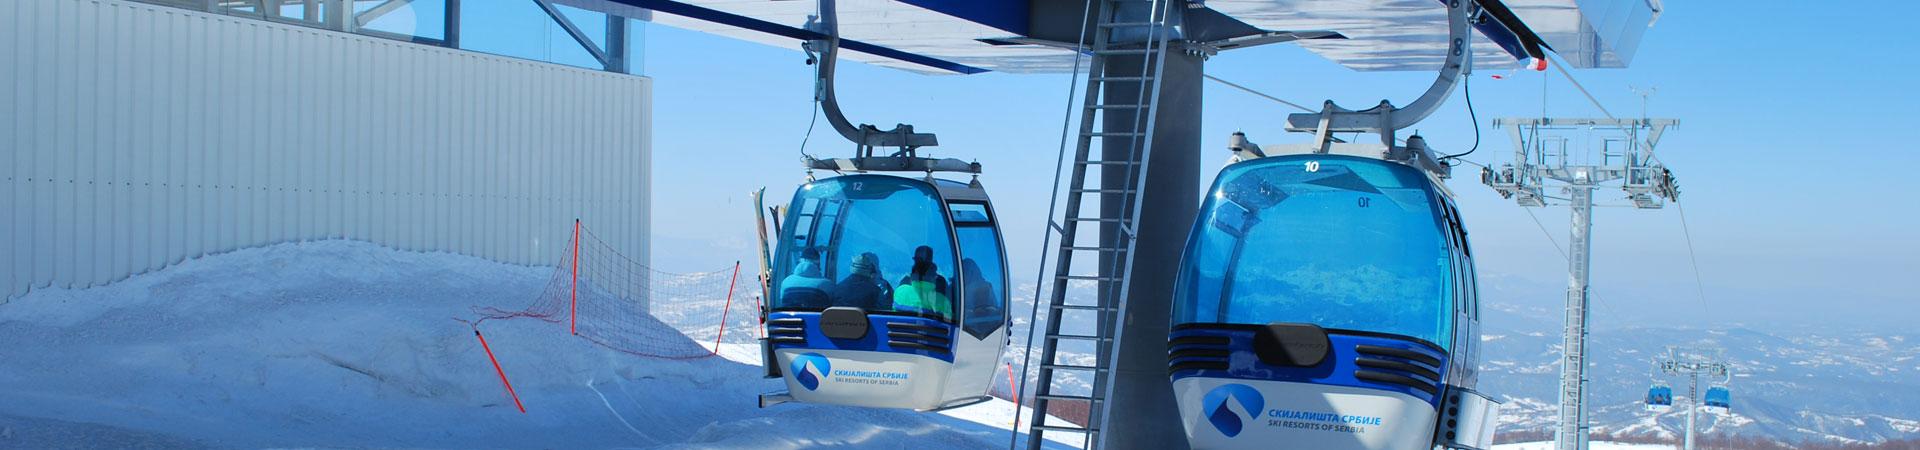 gondole-skijalista